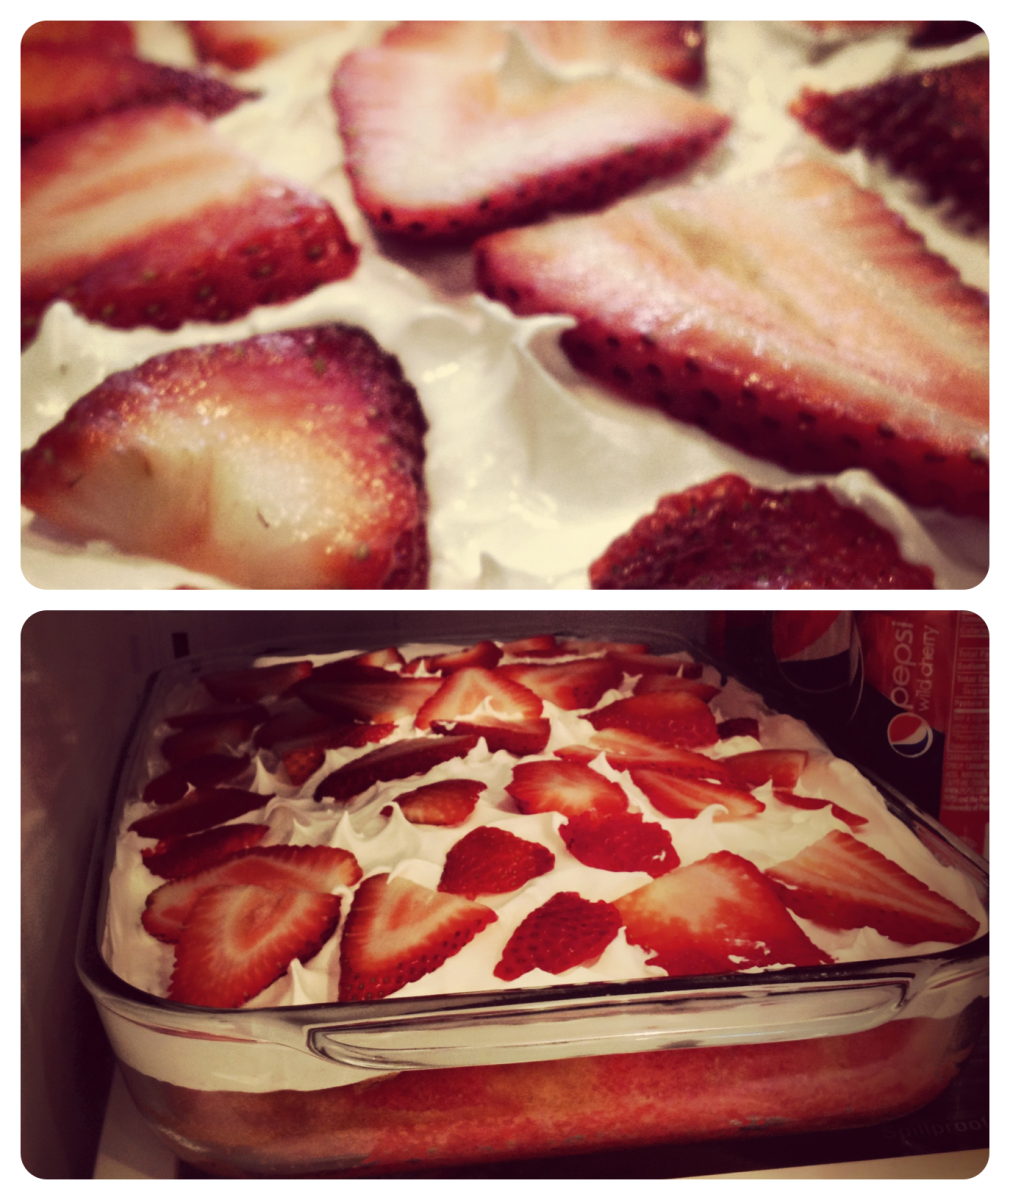 Cold Cake Dessert